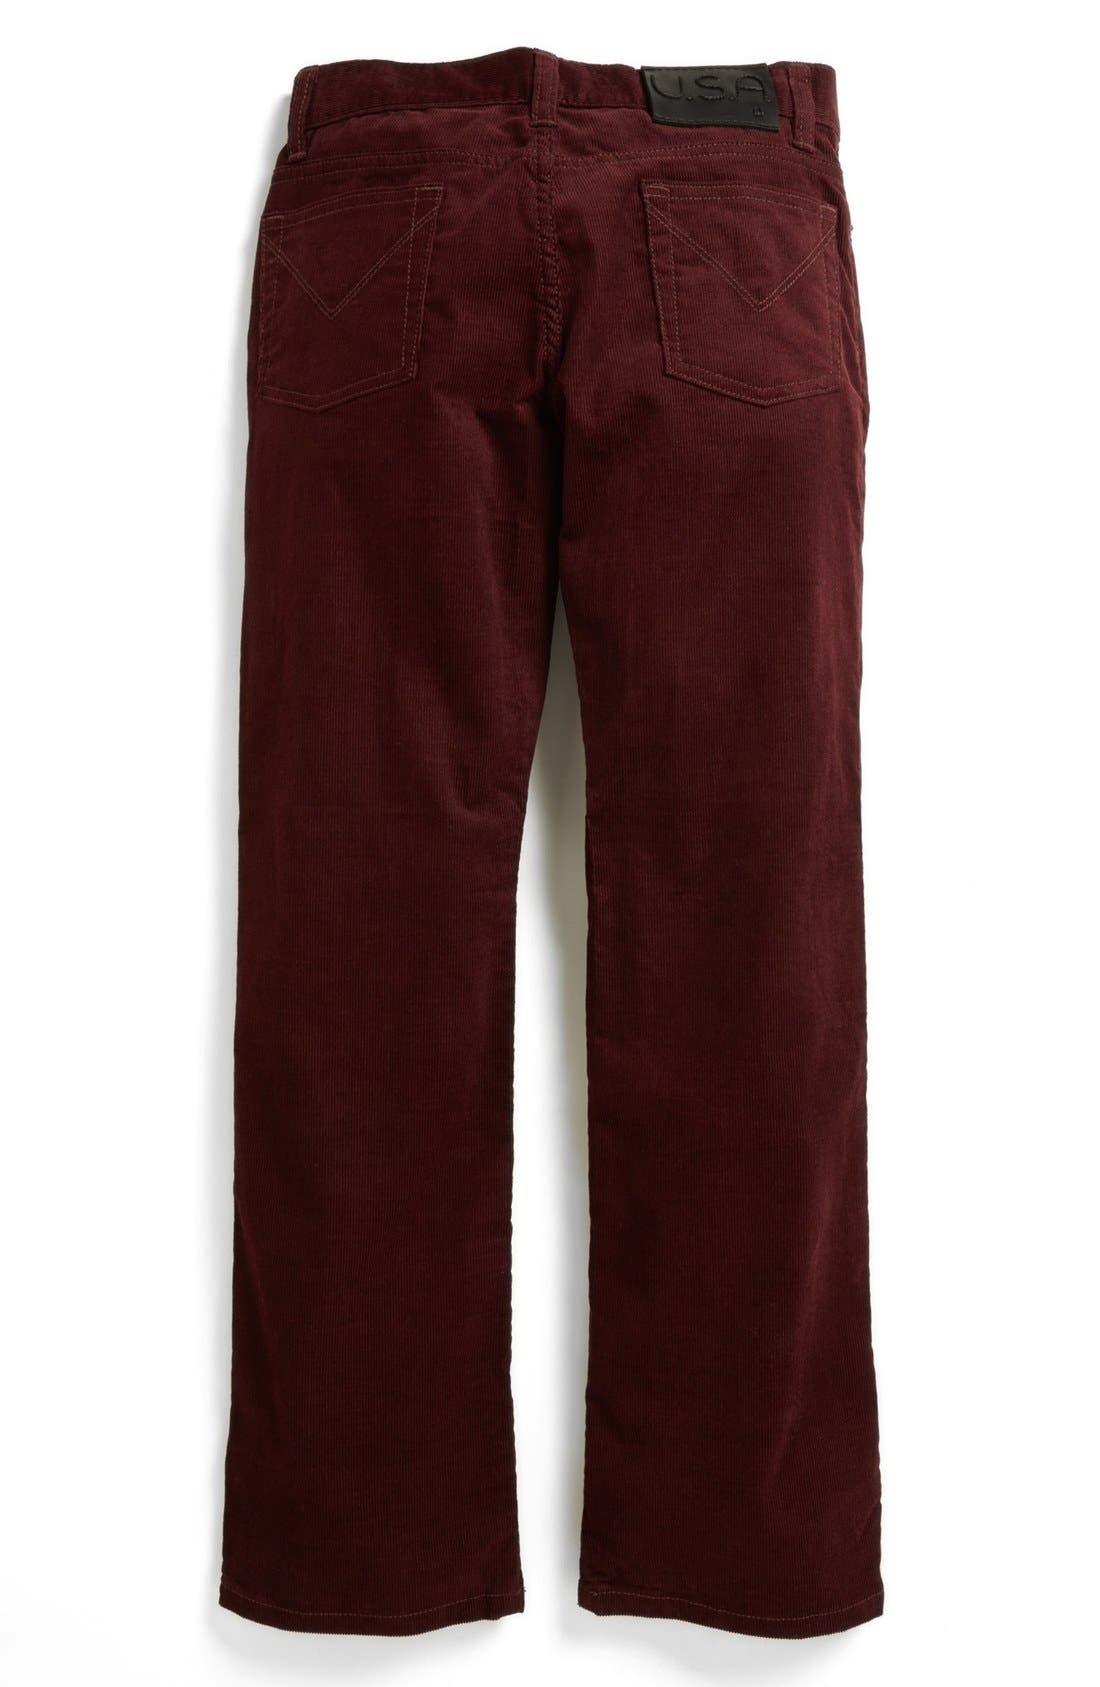 Alternate Image 1 Selected - John Varvatos Star USA Corduroy Jeans (Big Boys)